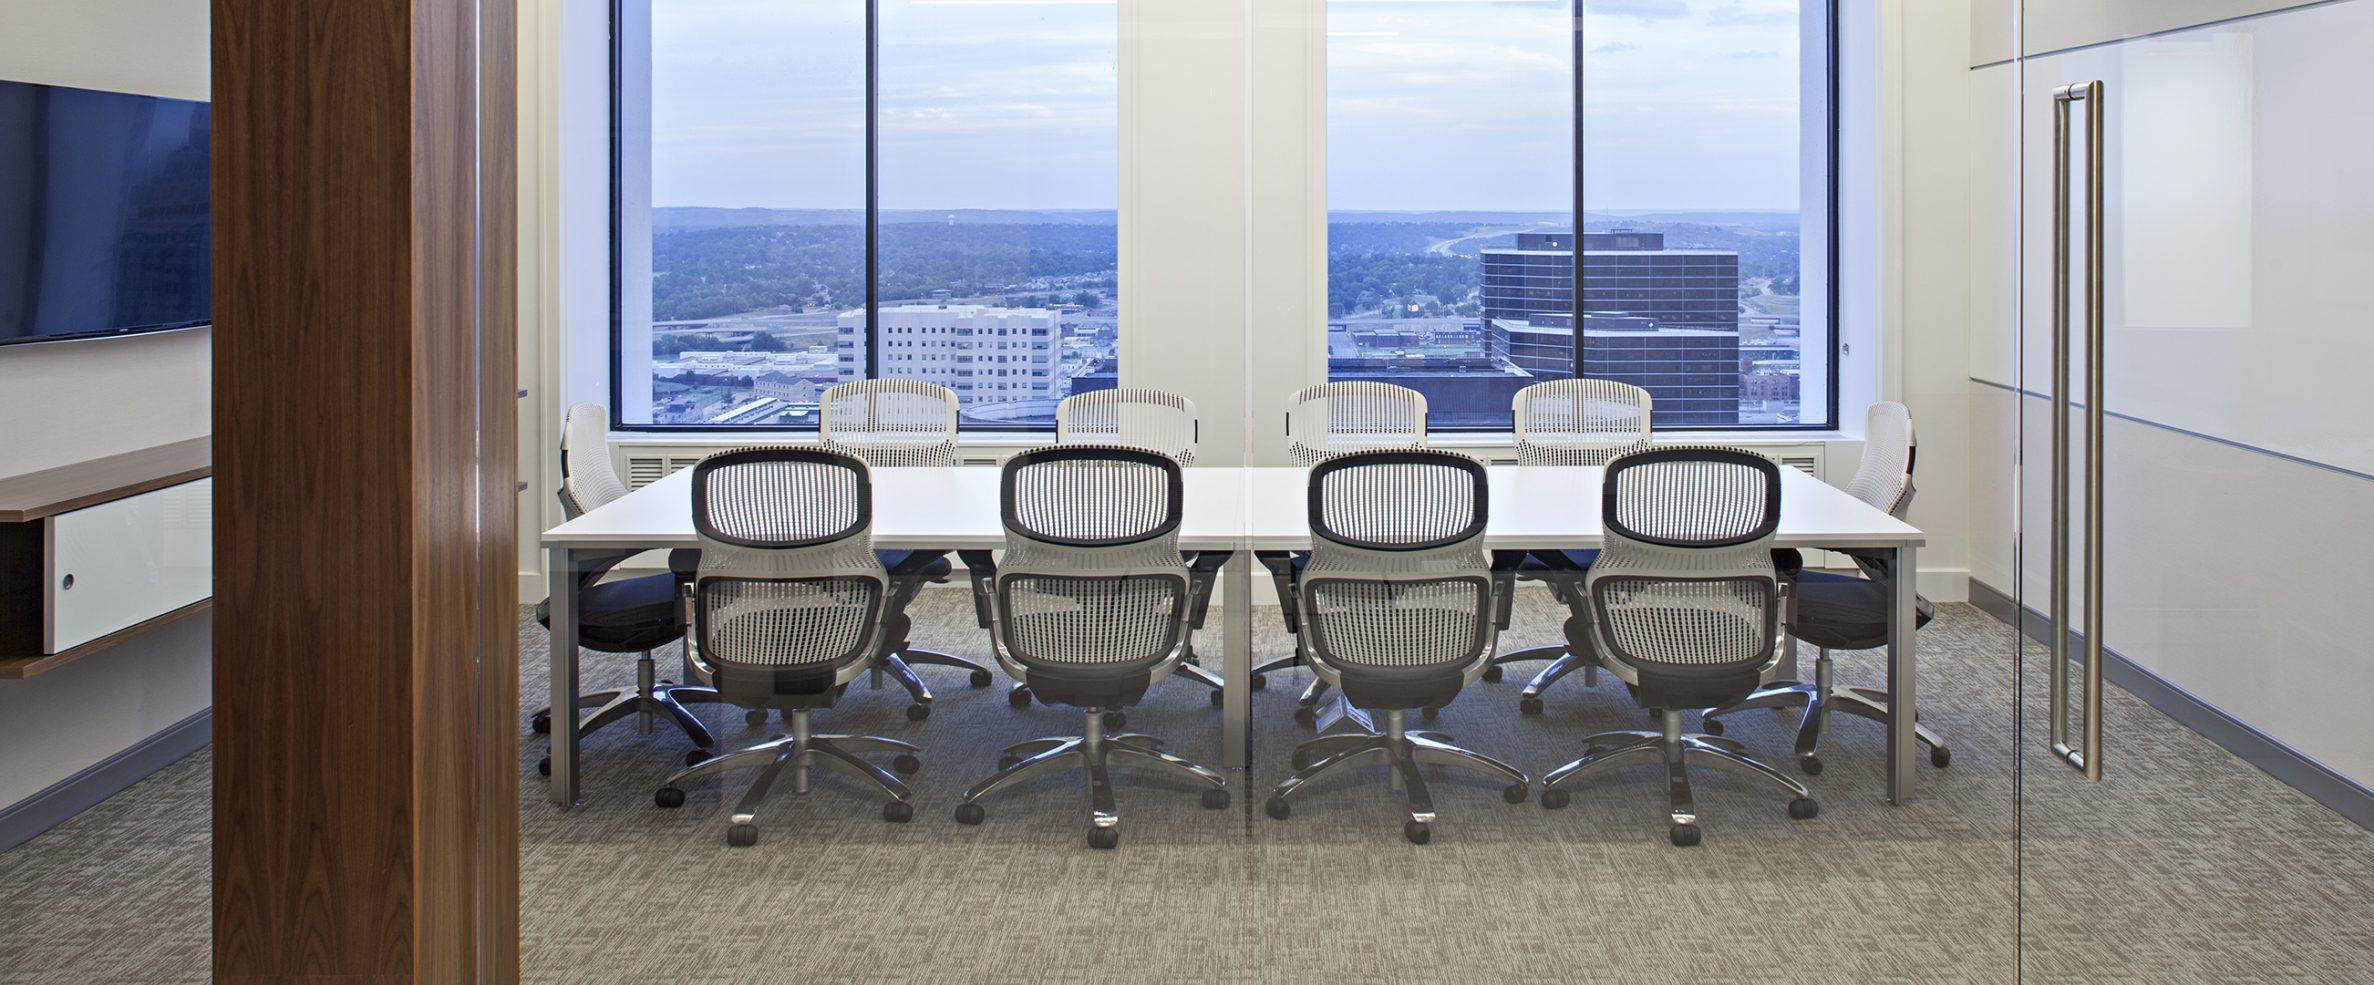 Knoll - Generation - bureaustoel - vergaderstoel - meetingroom - kantoorinrichting